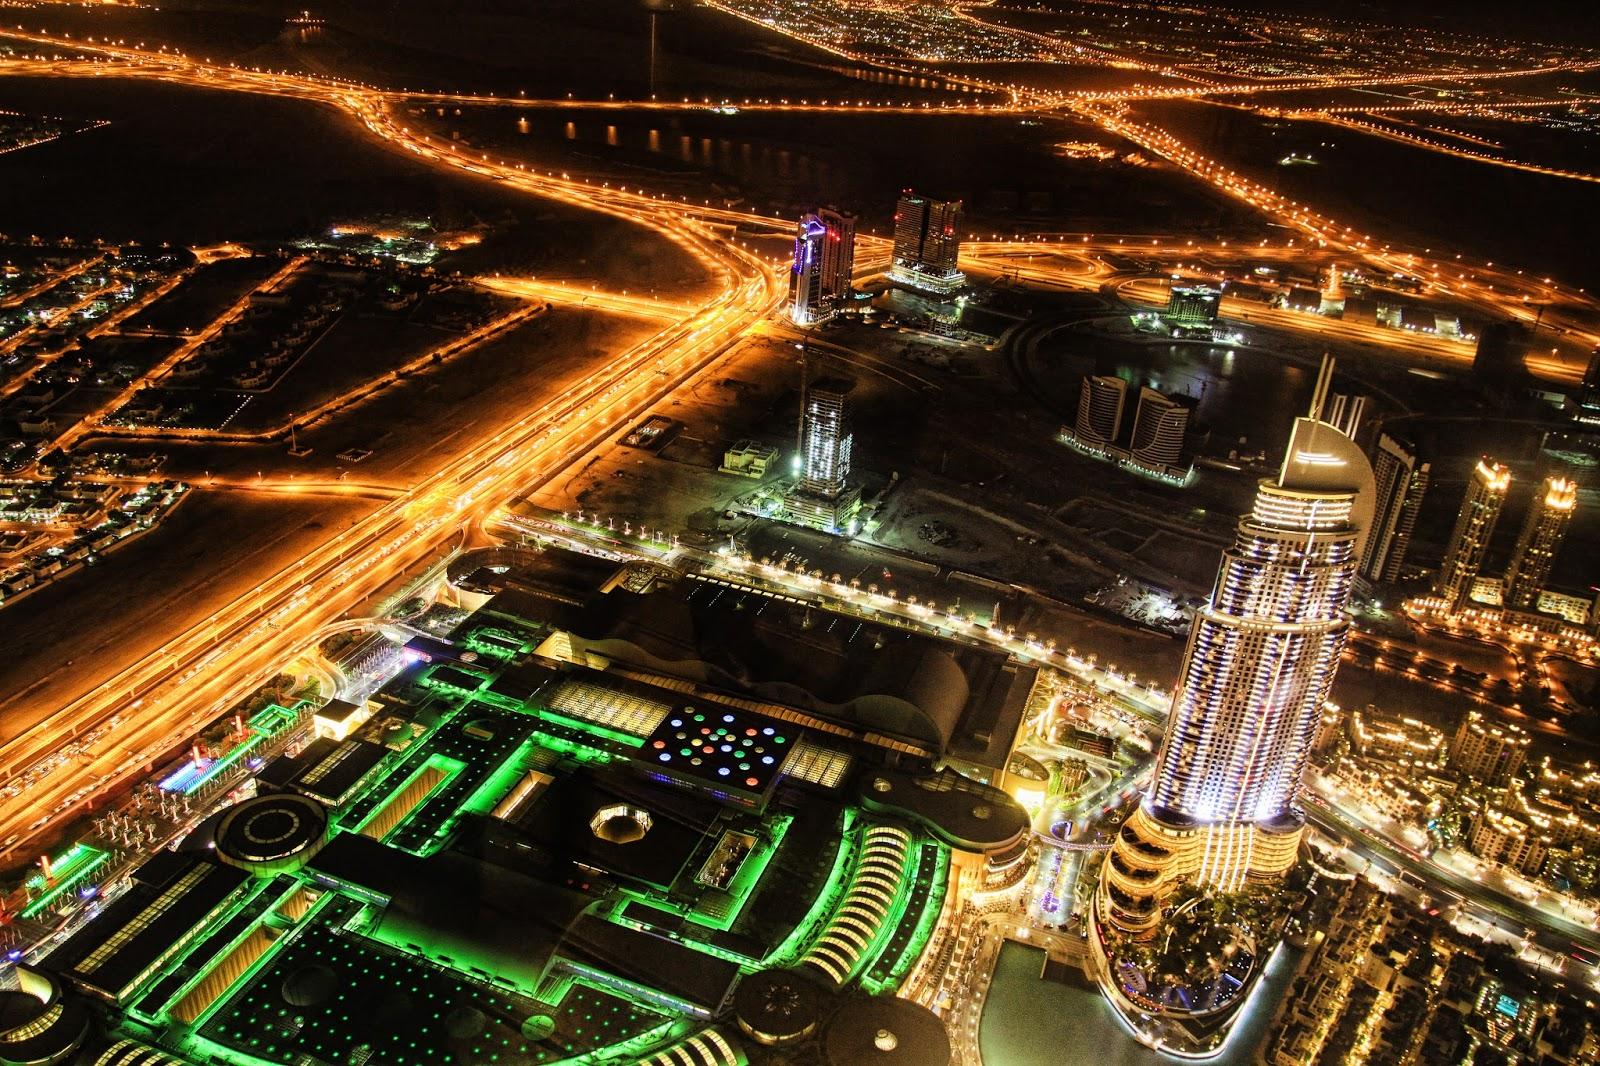 Burj Khalifa View, Dubai